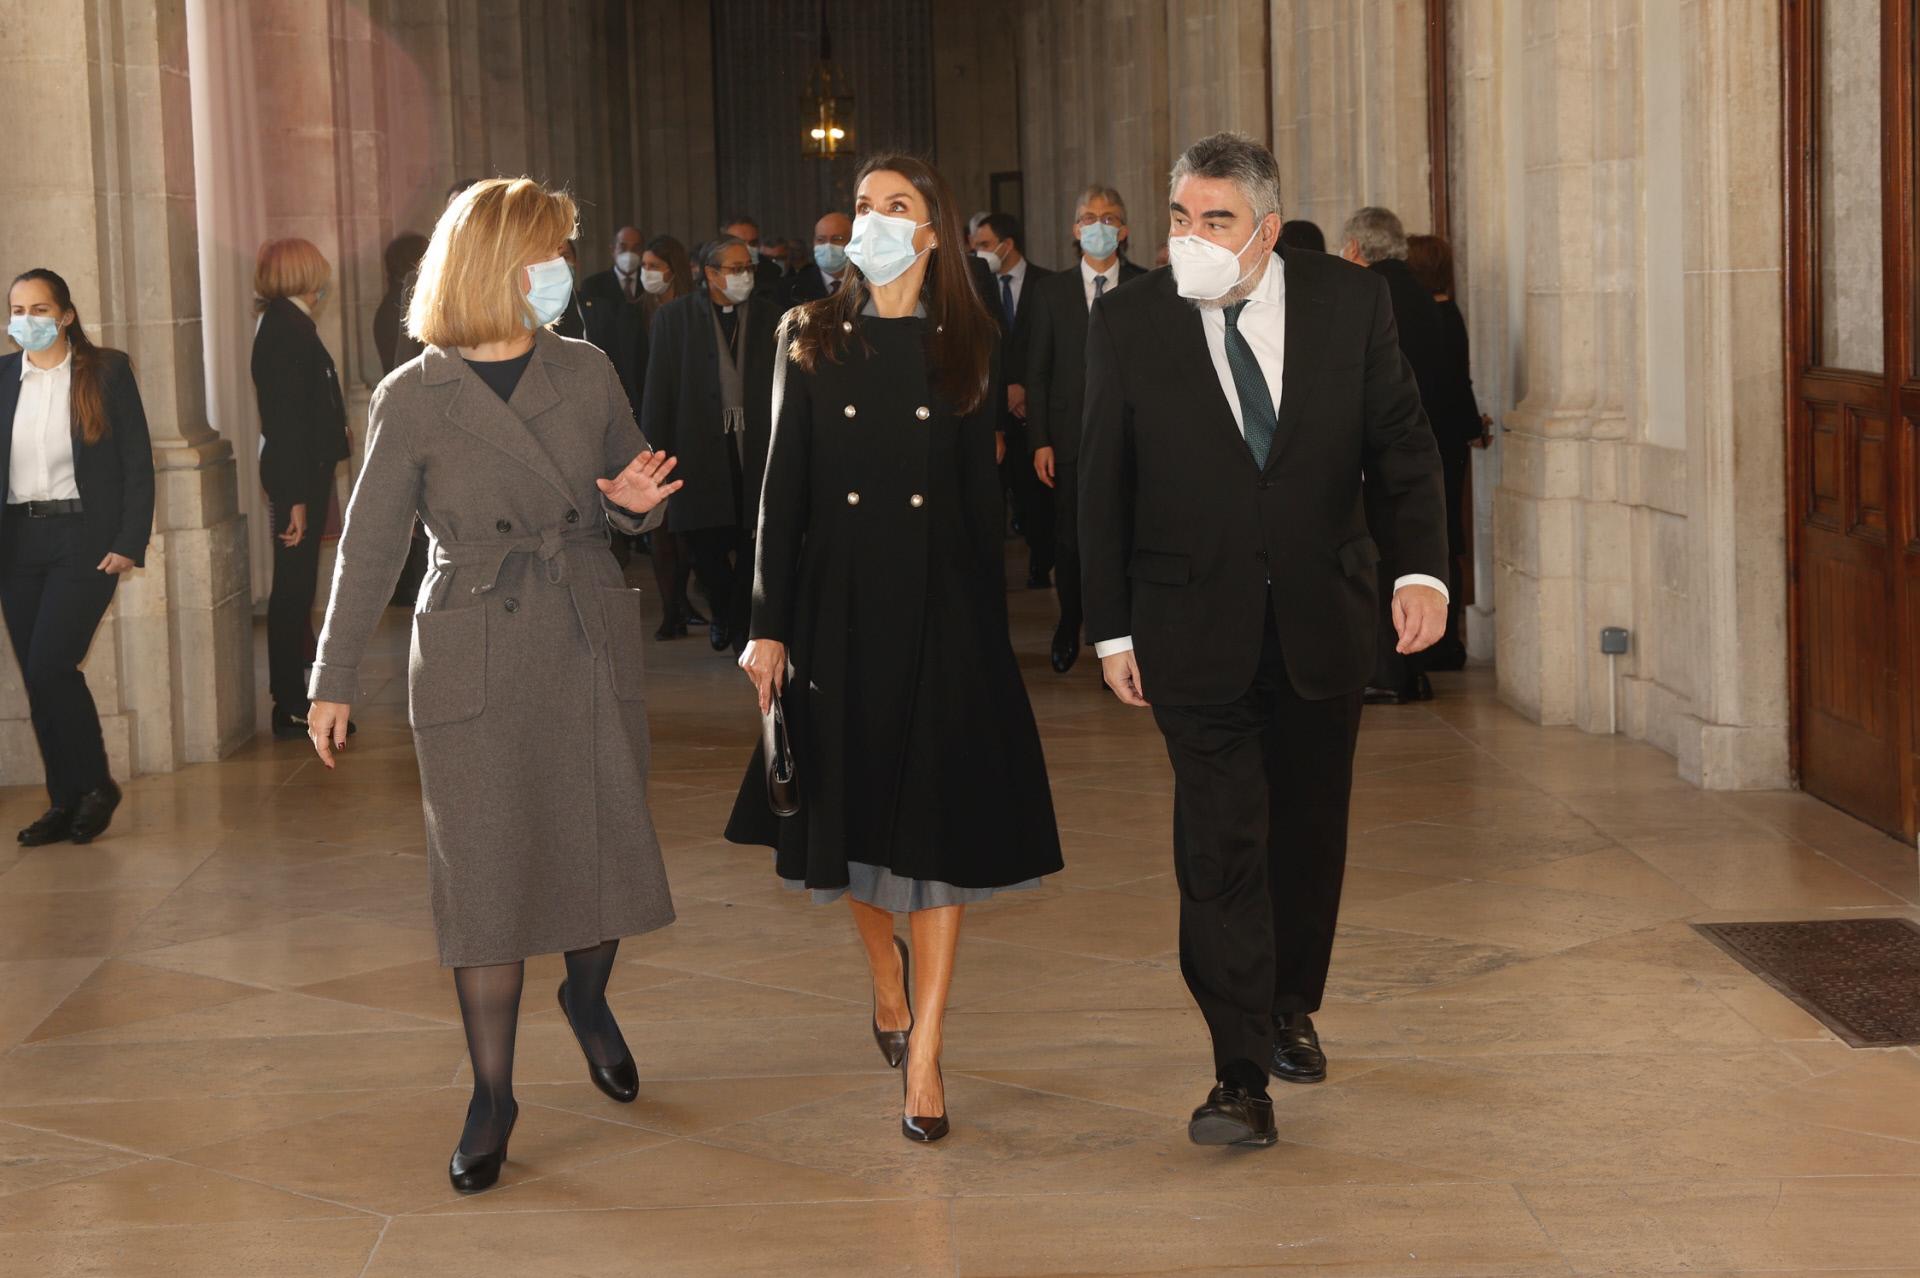 La reina Letizia con un abrigo negro de Carolina Herrera.